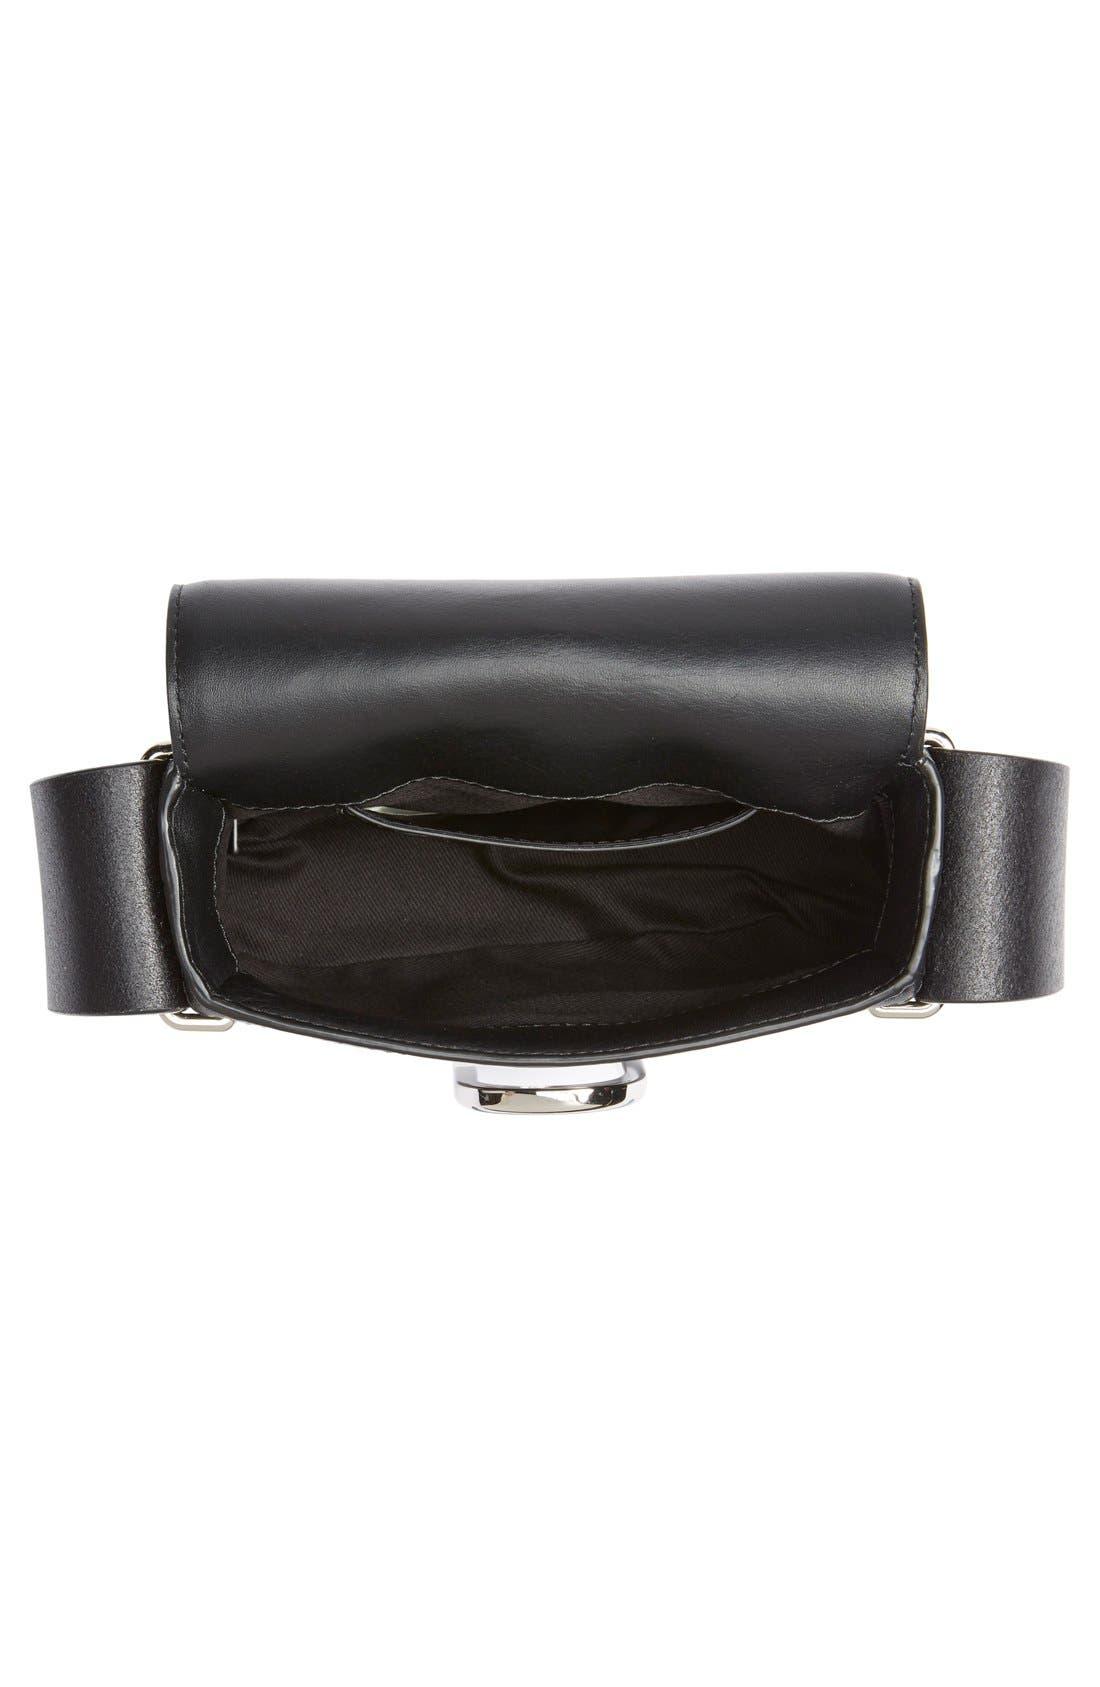 'Mini Alix' Leather Shoulder Bag,                             Alternate thumbnail 10, color,